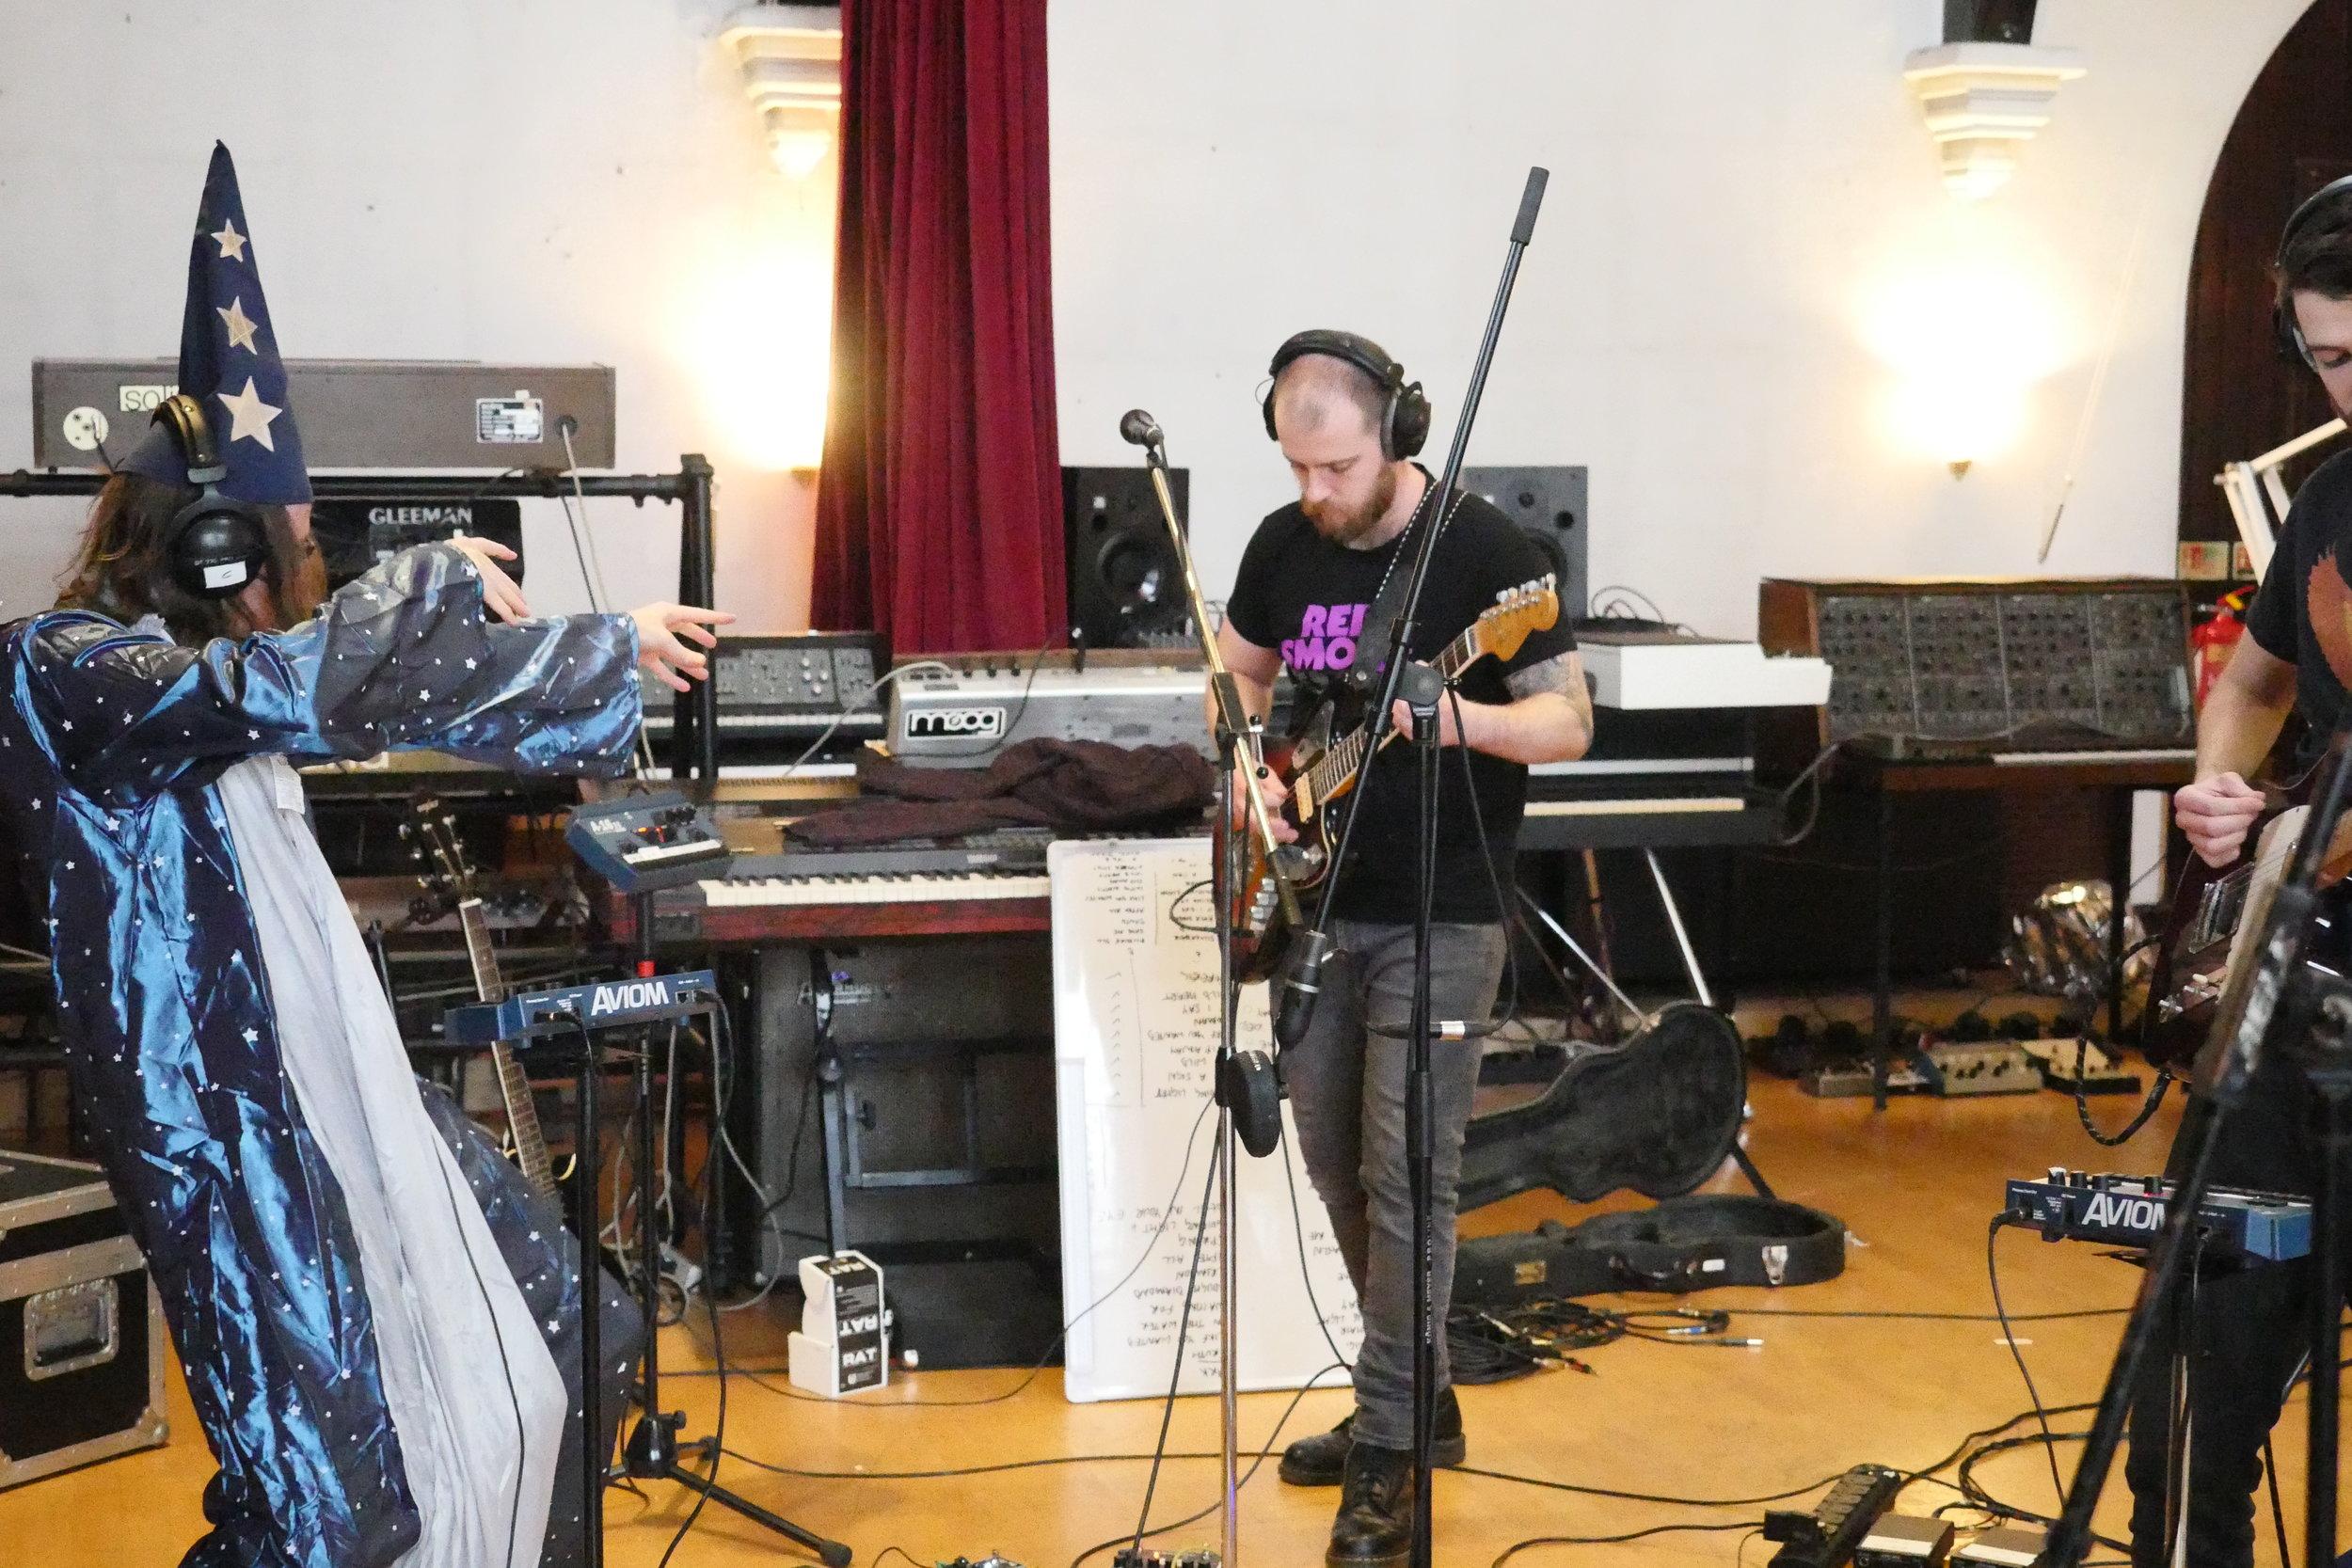 Alakazam, Alakazar, Zip Zap Zoobidy, Play that guitar!